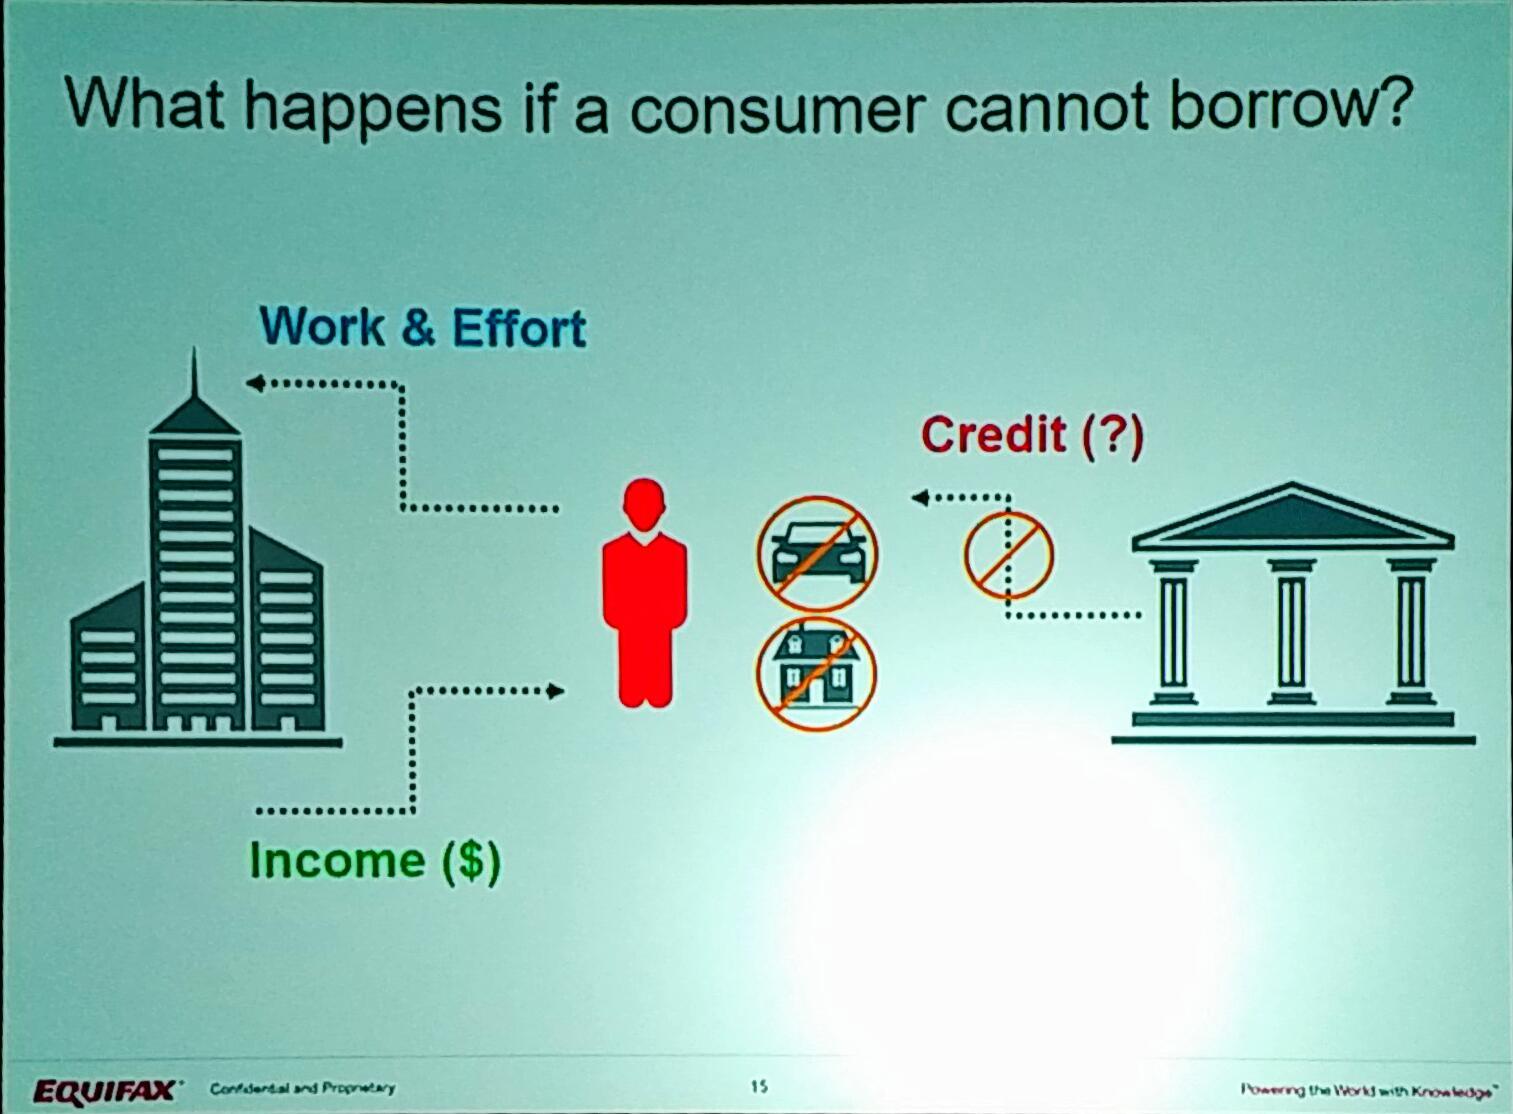 Next - @nhamdi links information assymetry as example during the financial crisis #EFXForum17 https://t.co/spdEzdW4Vw